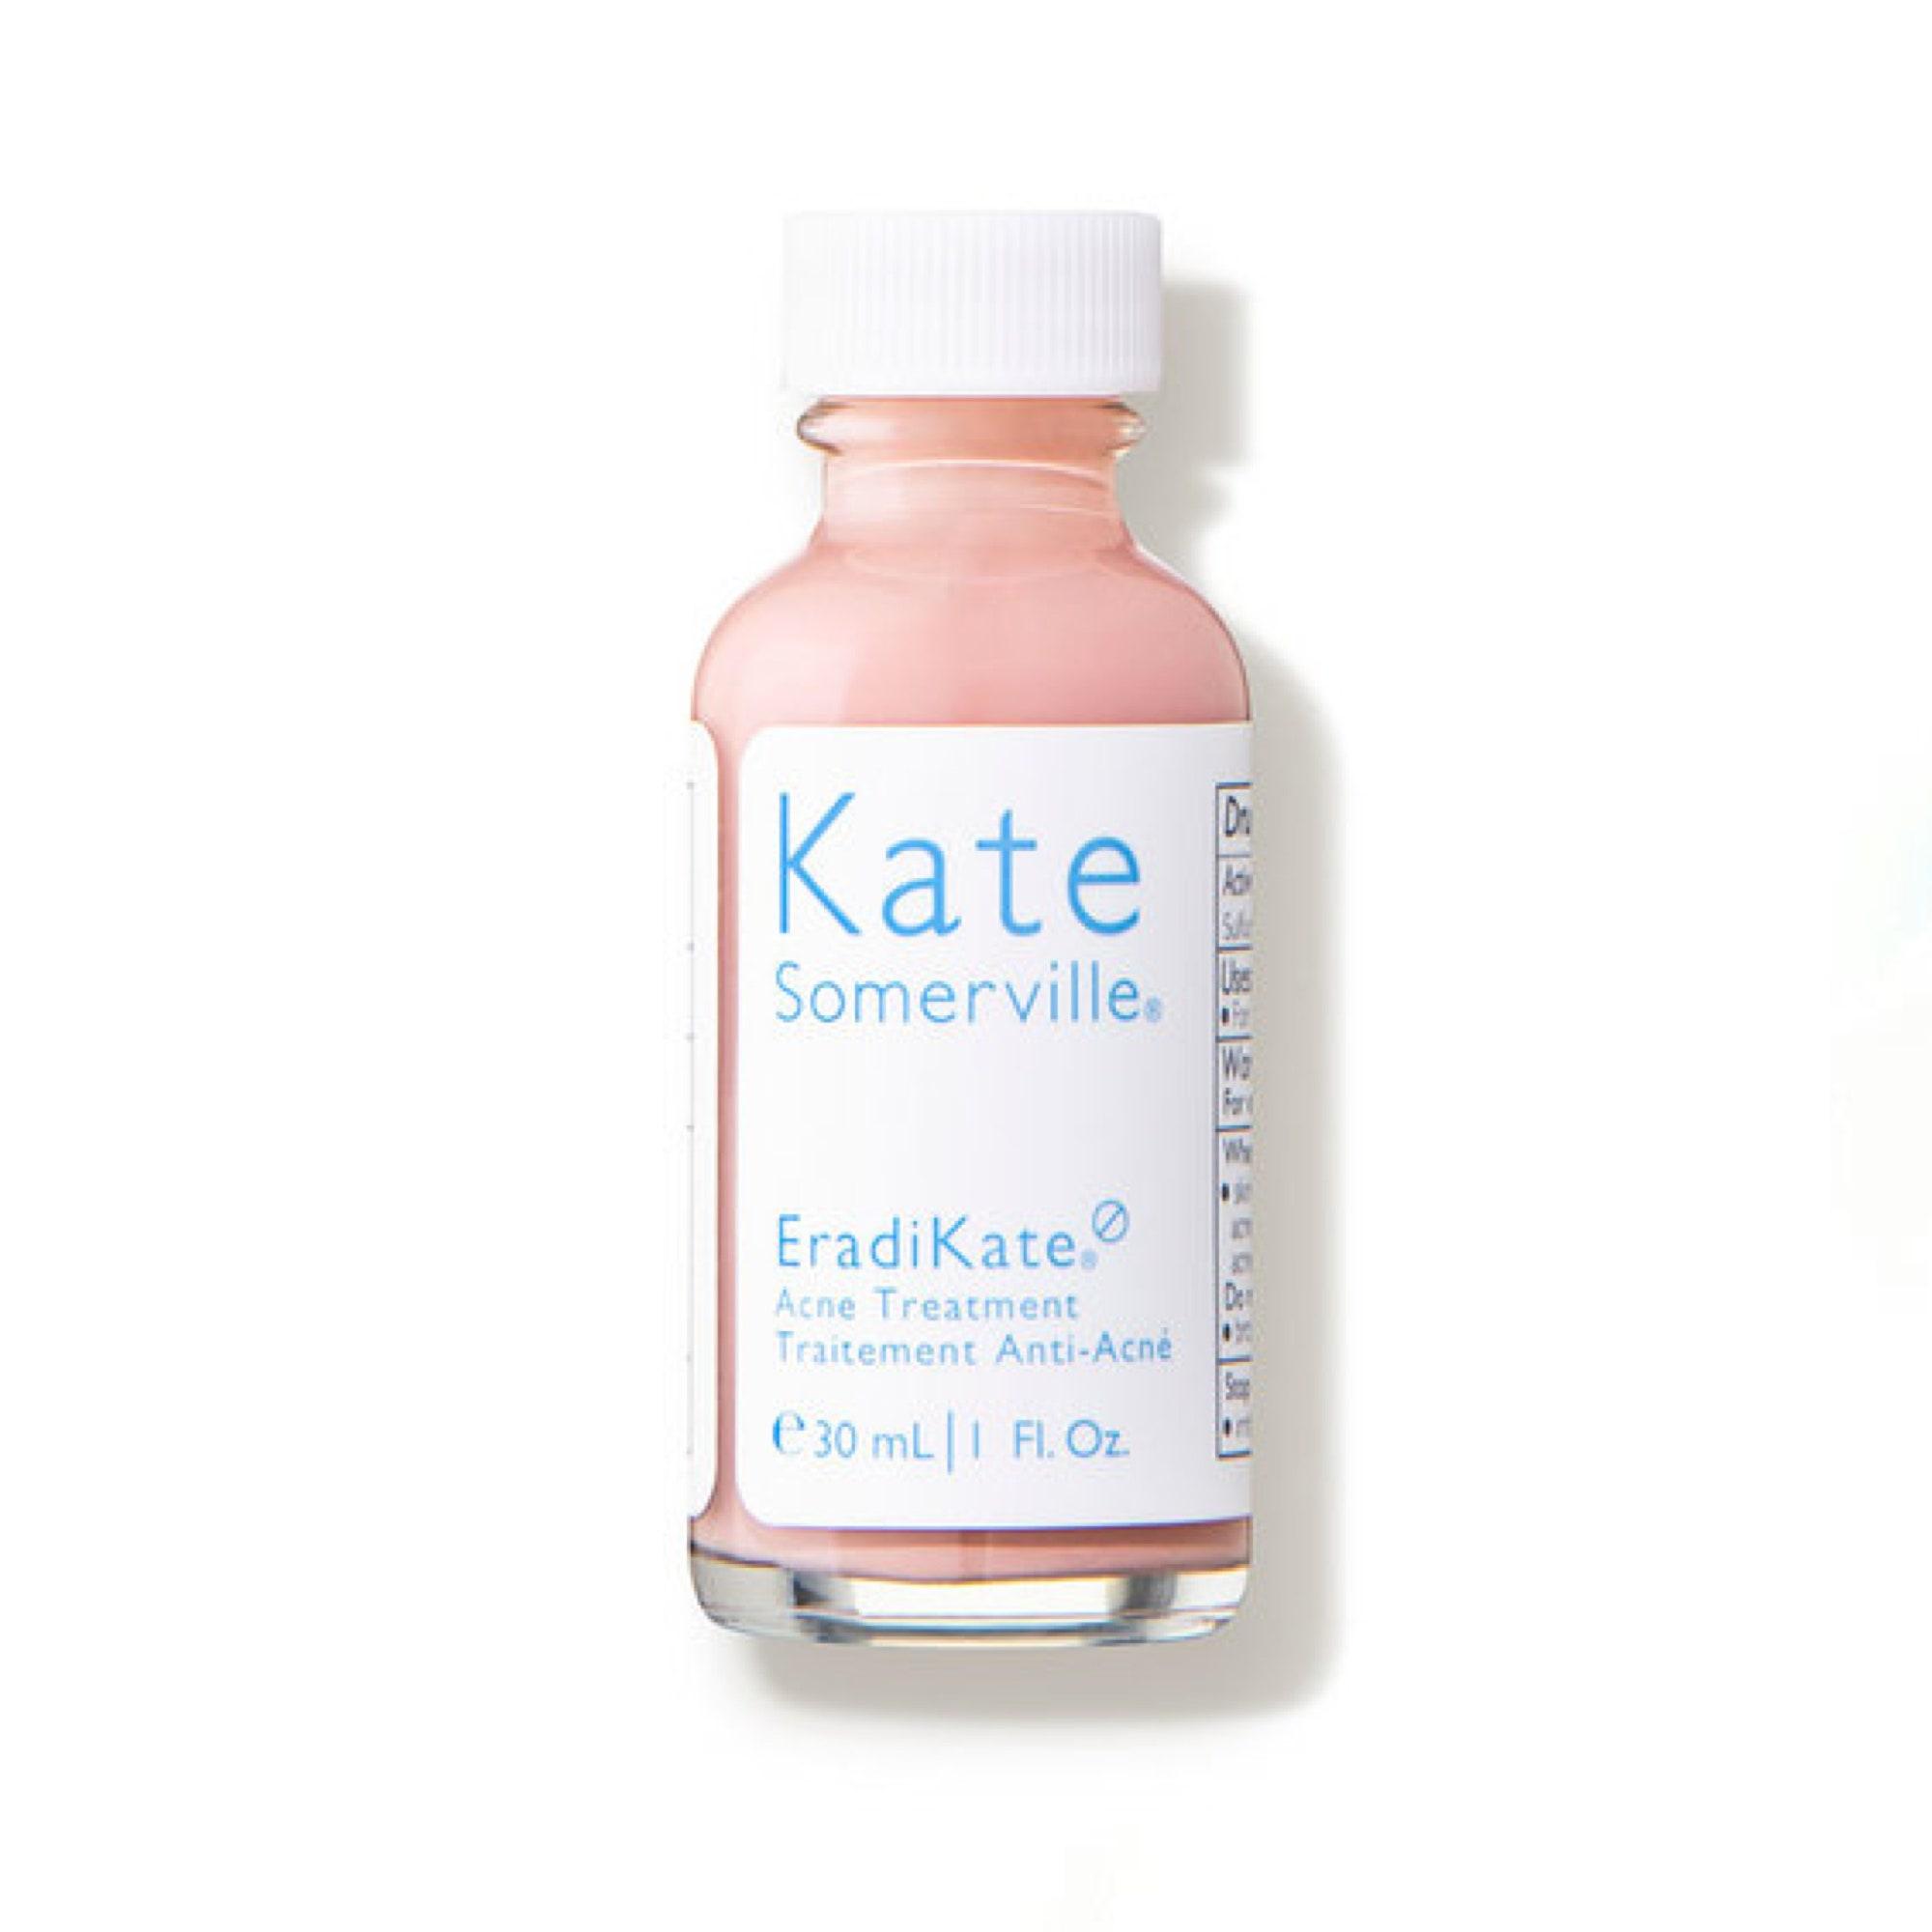 bottle of acne treatment